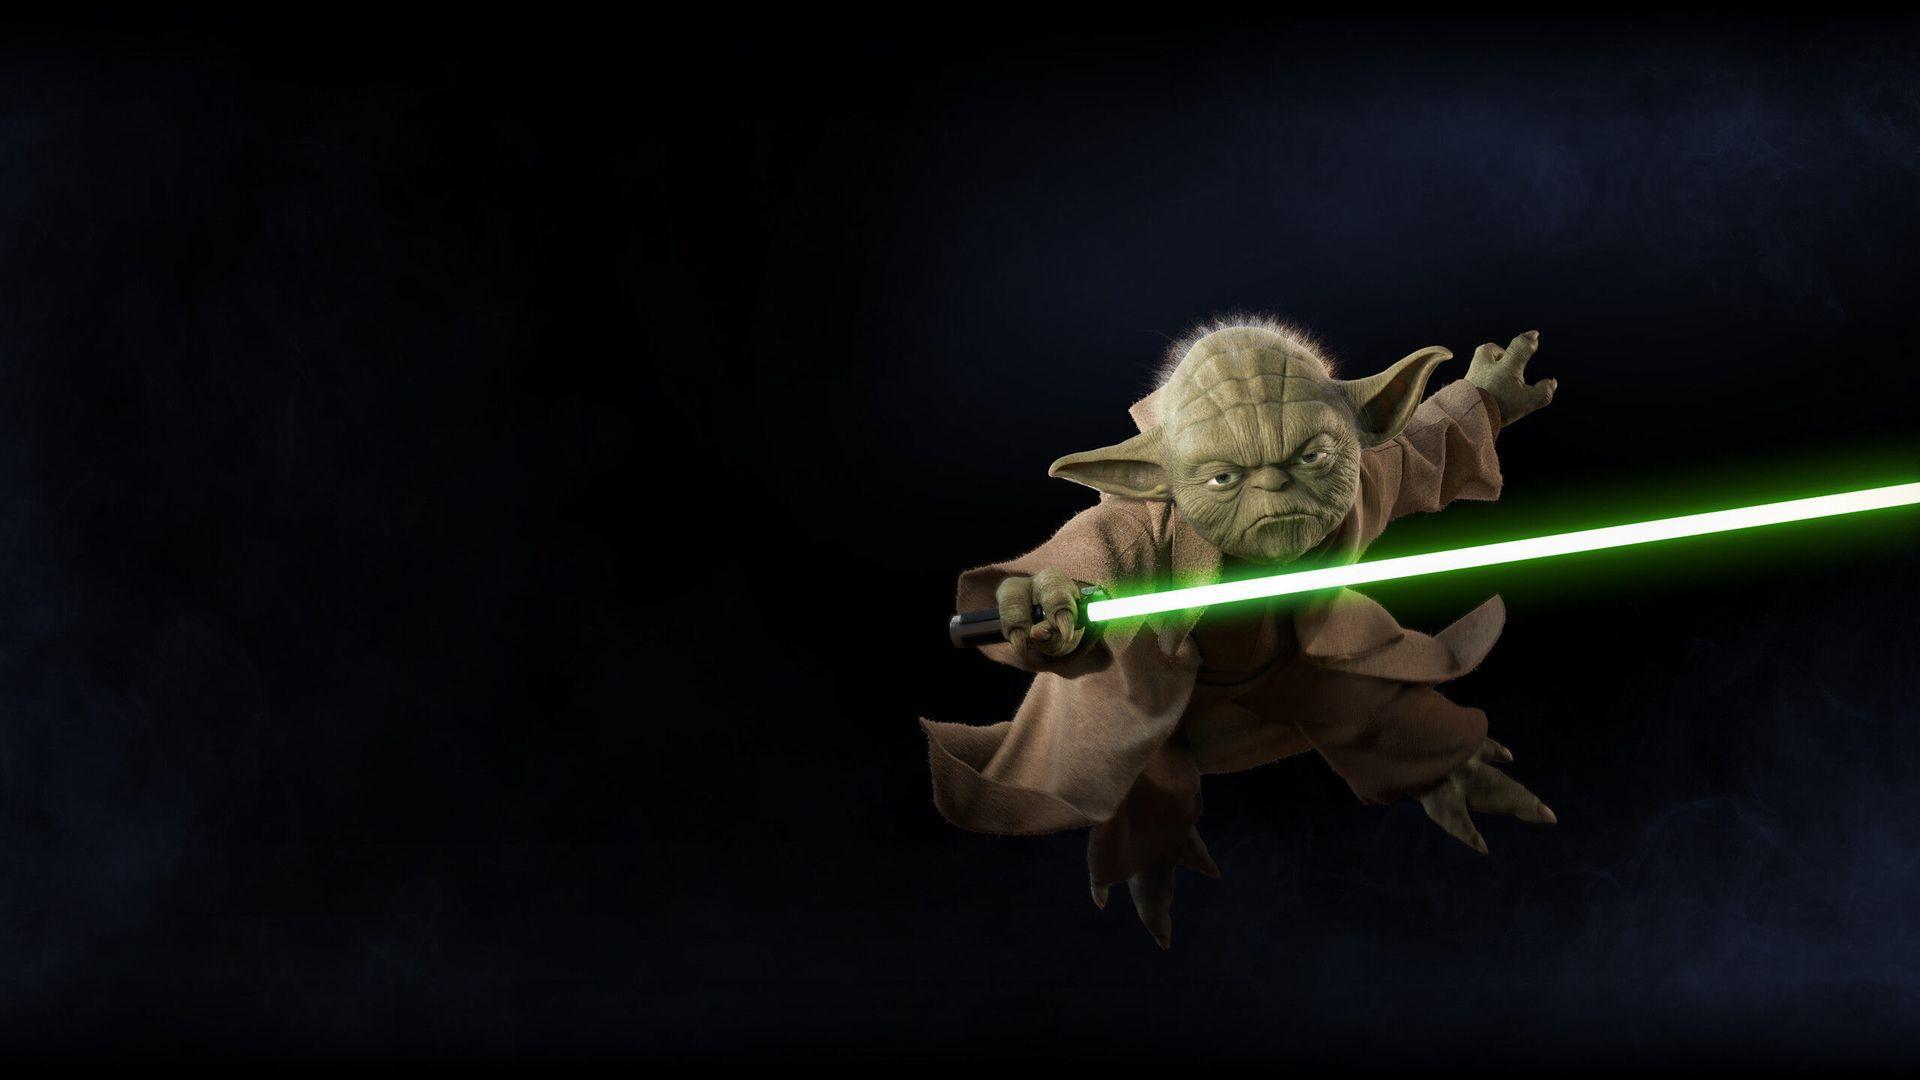 Star Wars Yoda Wallpapers - Top Free Star Wars Yoda Backgrounds